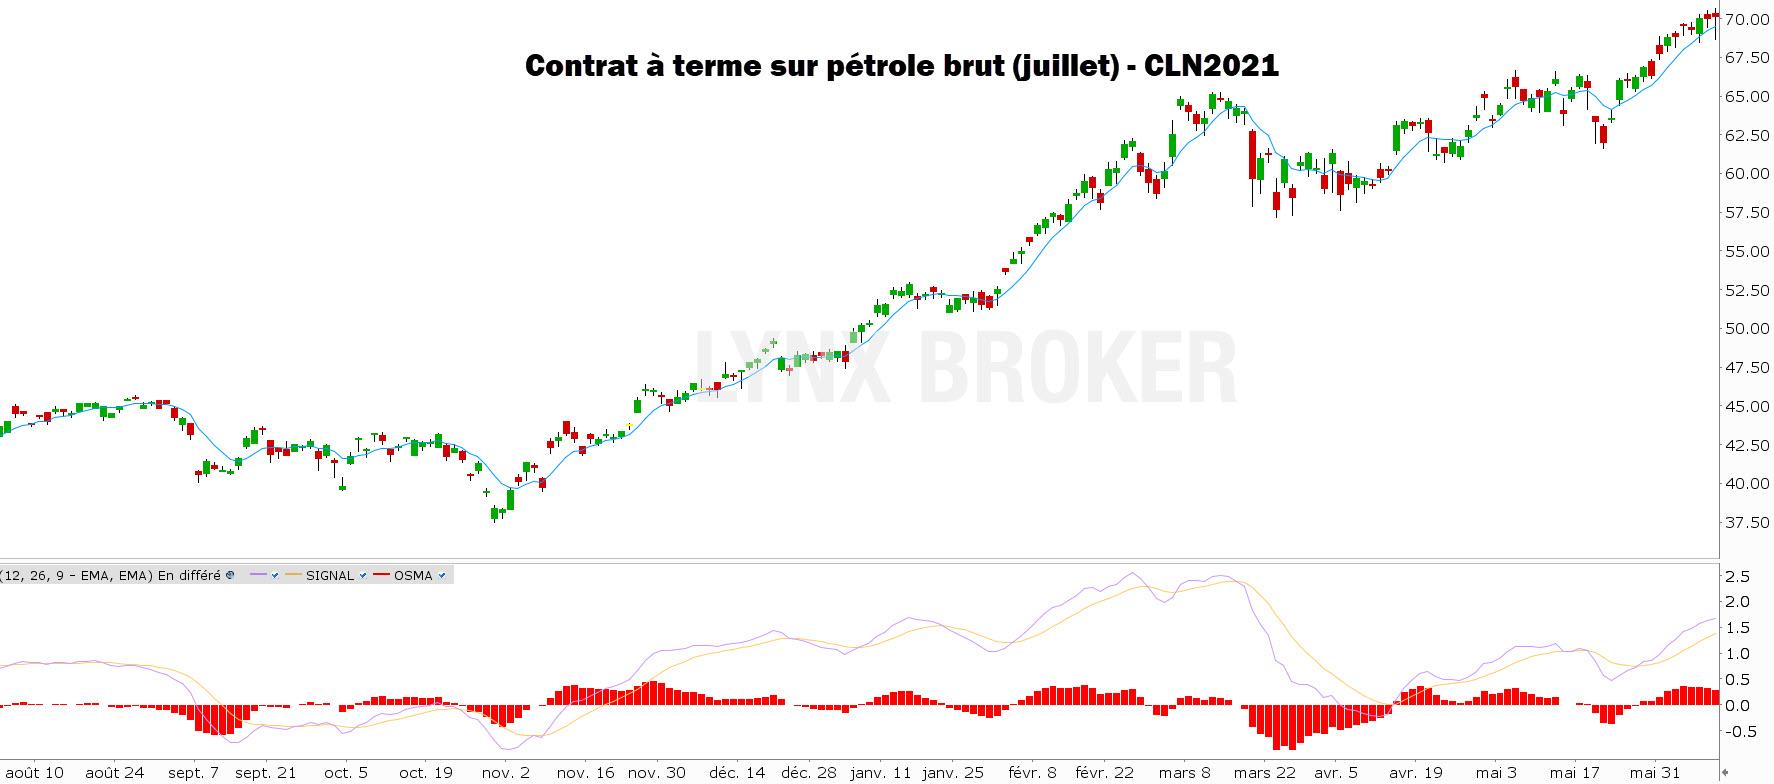 cours du petrole prevision - petrole 2021 - light sweet crude oil